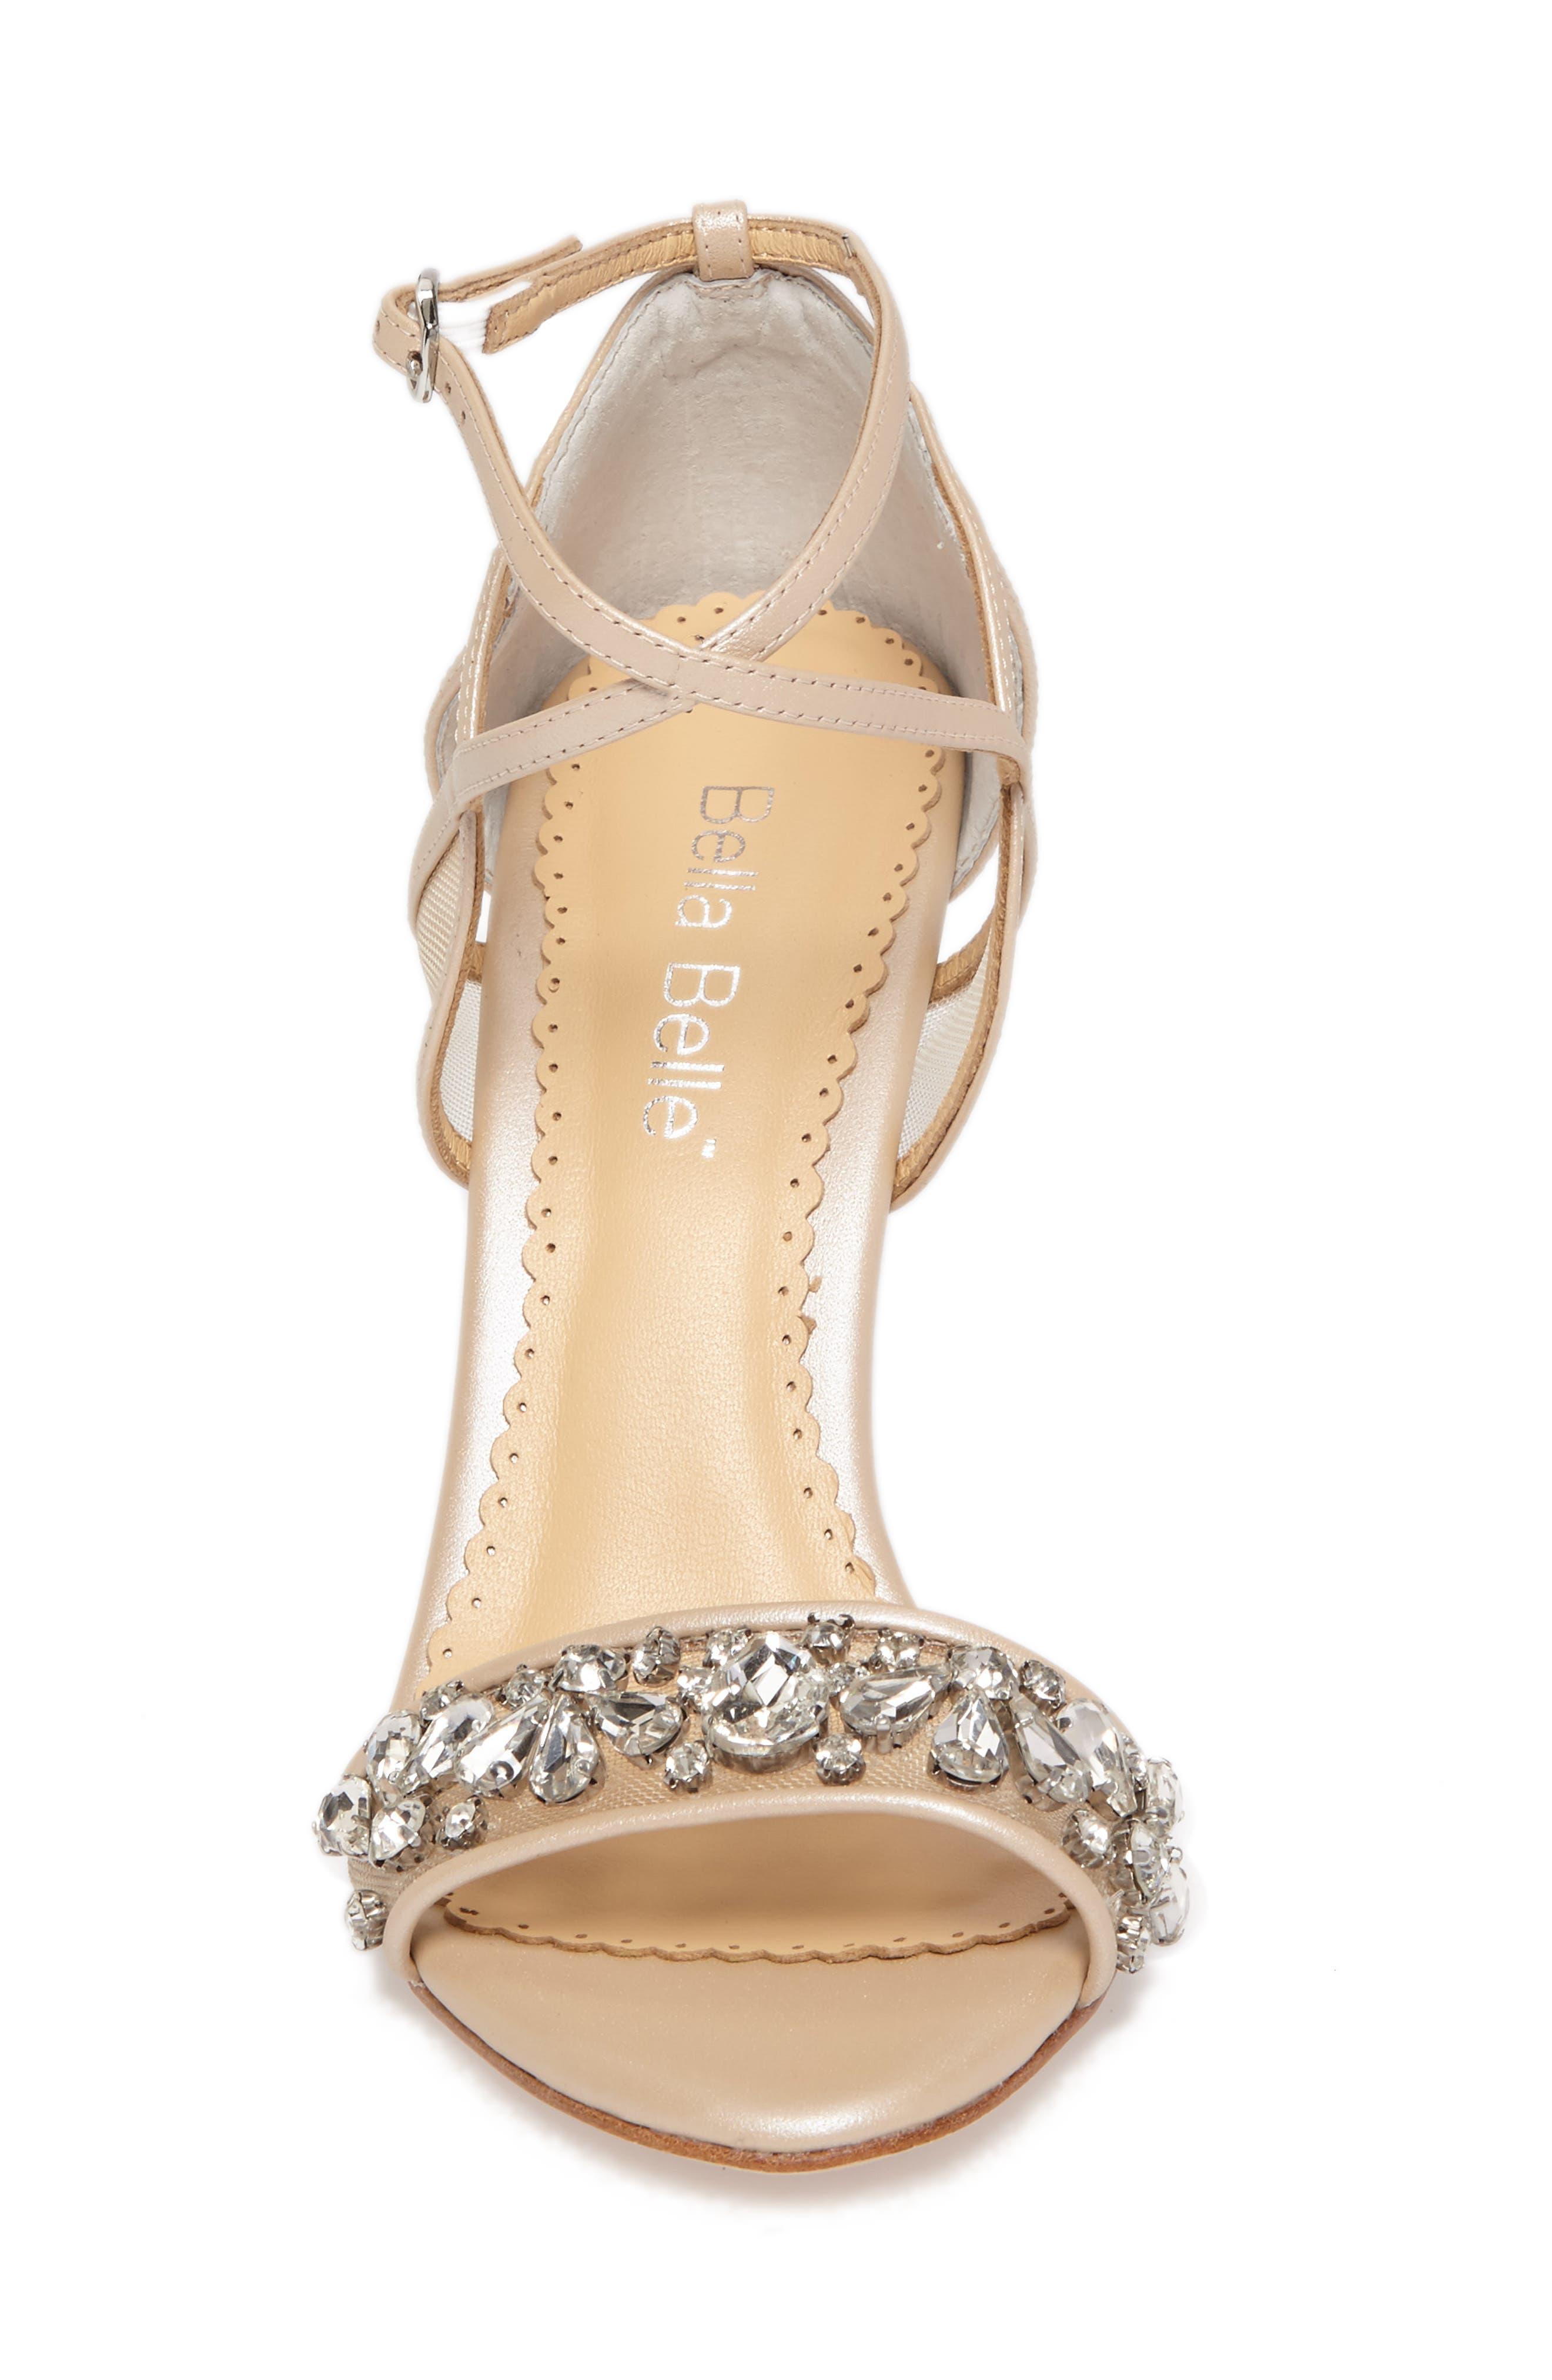 Filipa Embellished Ankle Strap Sandal,                             Alternate thumbnail 4, color,                             Nude Leather